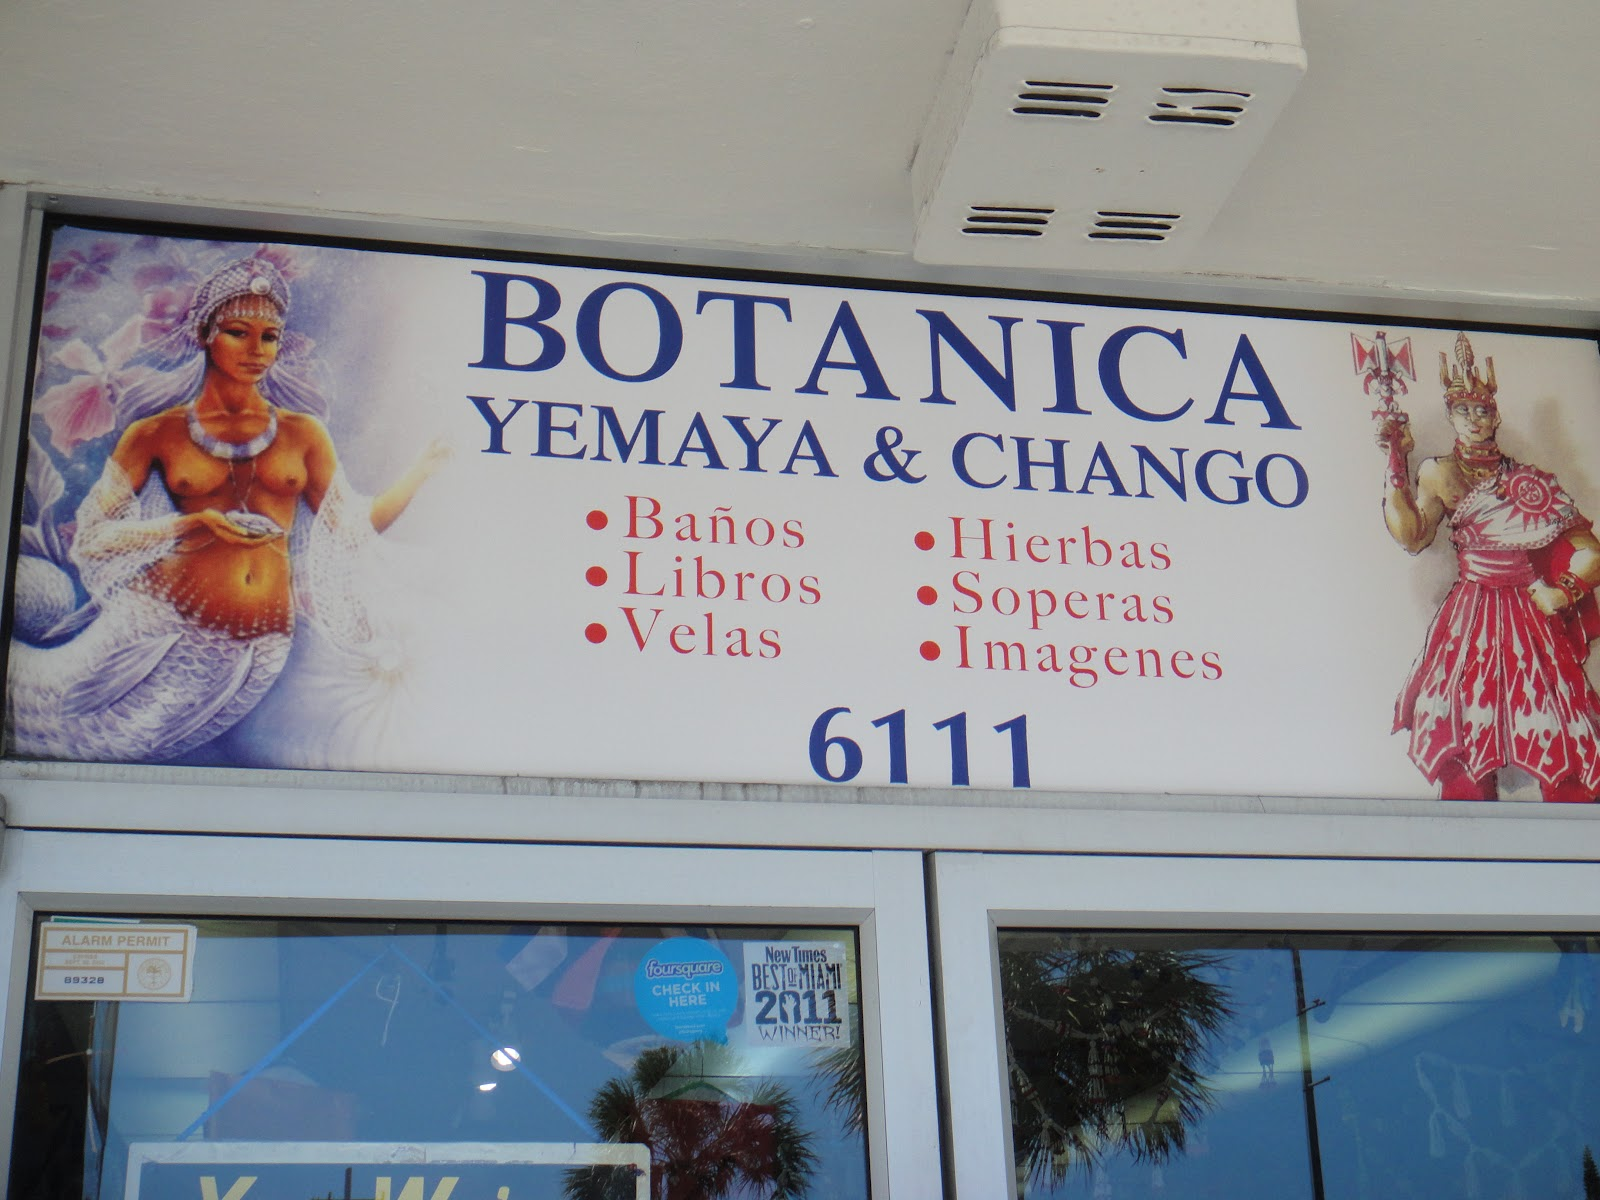 Monicajou: Botanica Yemaya and Chango- store pictures